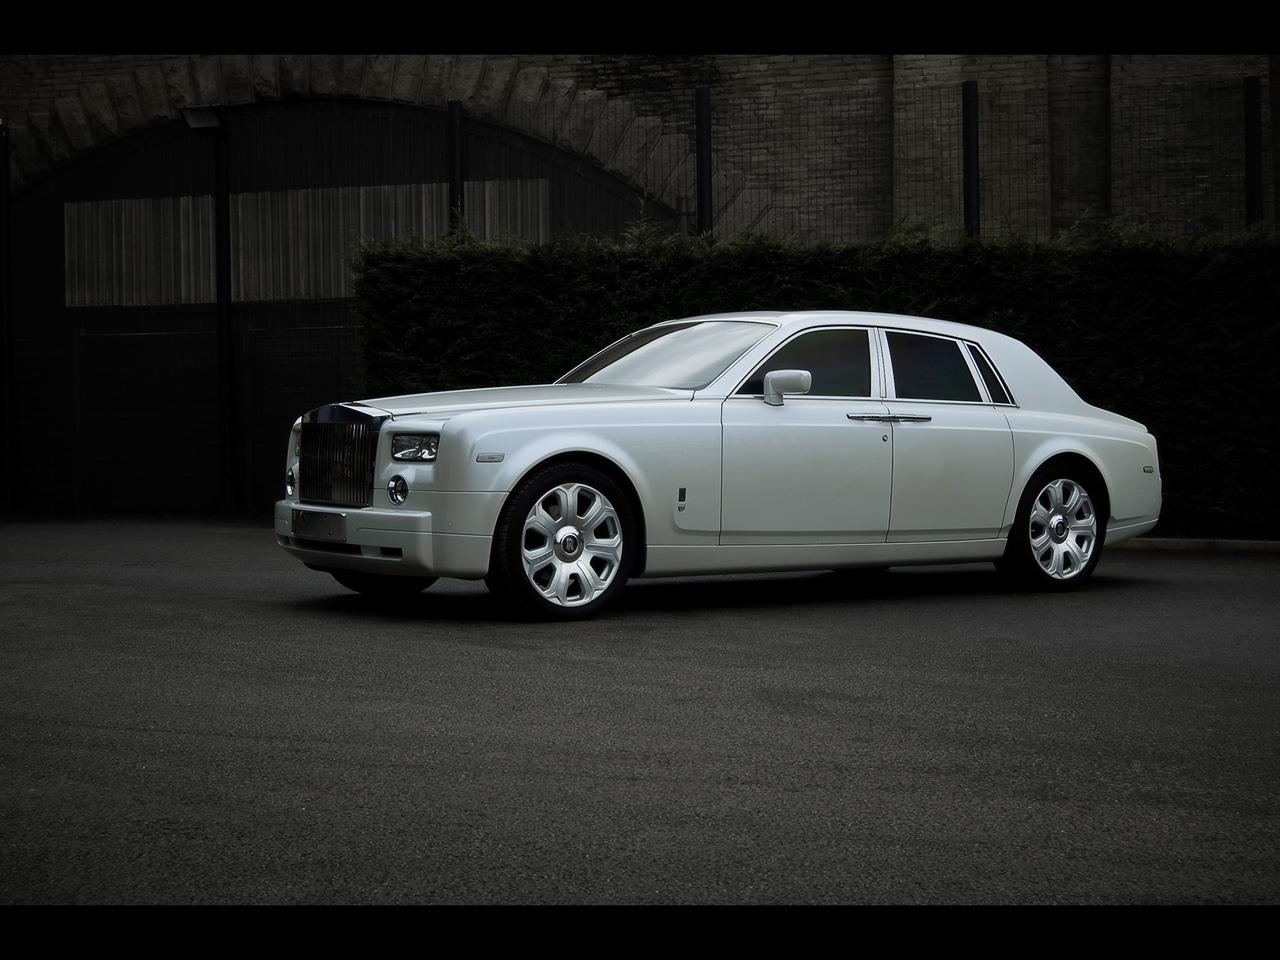 2009 Project Kahn Rolls Royce Phantom Wallpapers By Cars Wallpapers Net